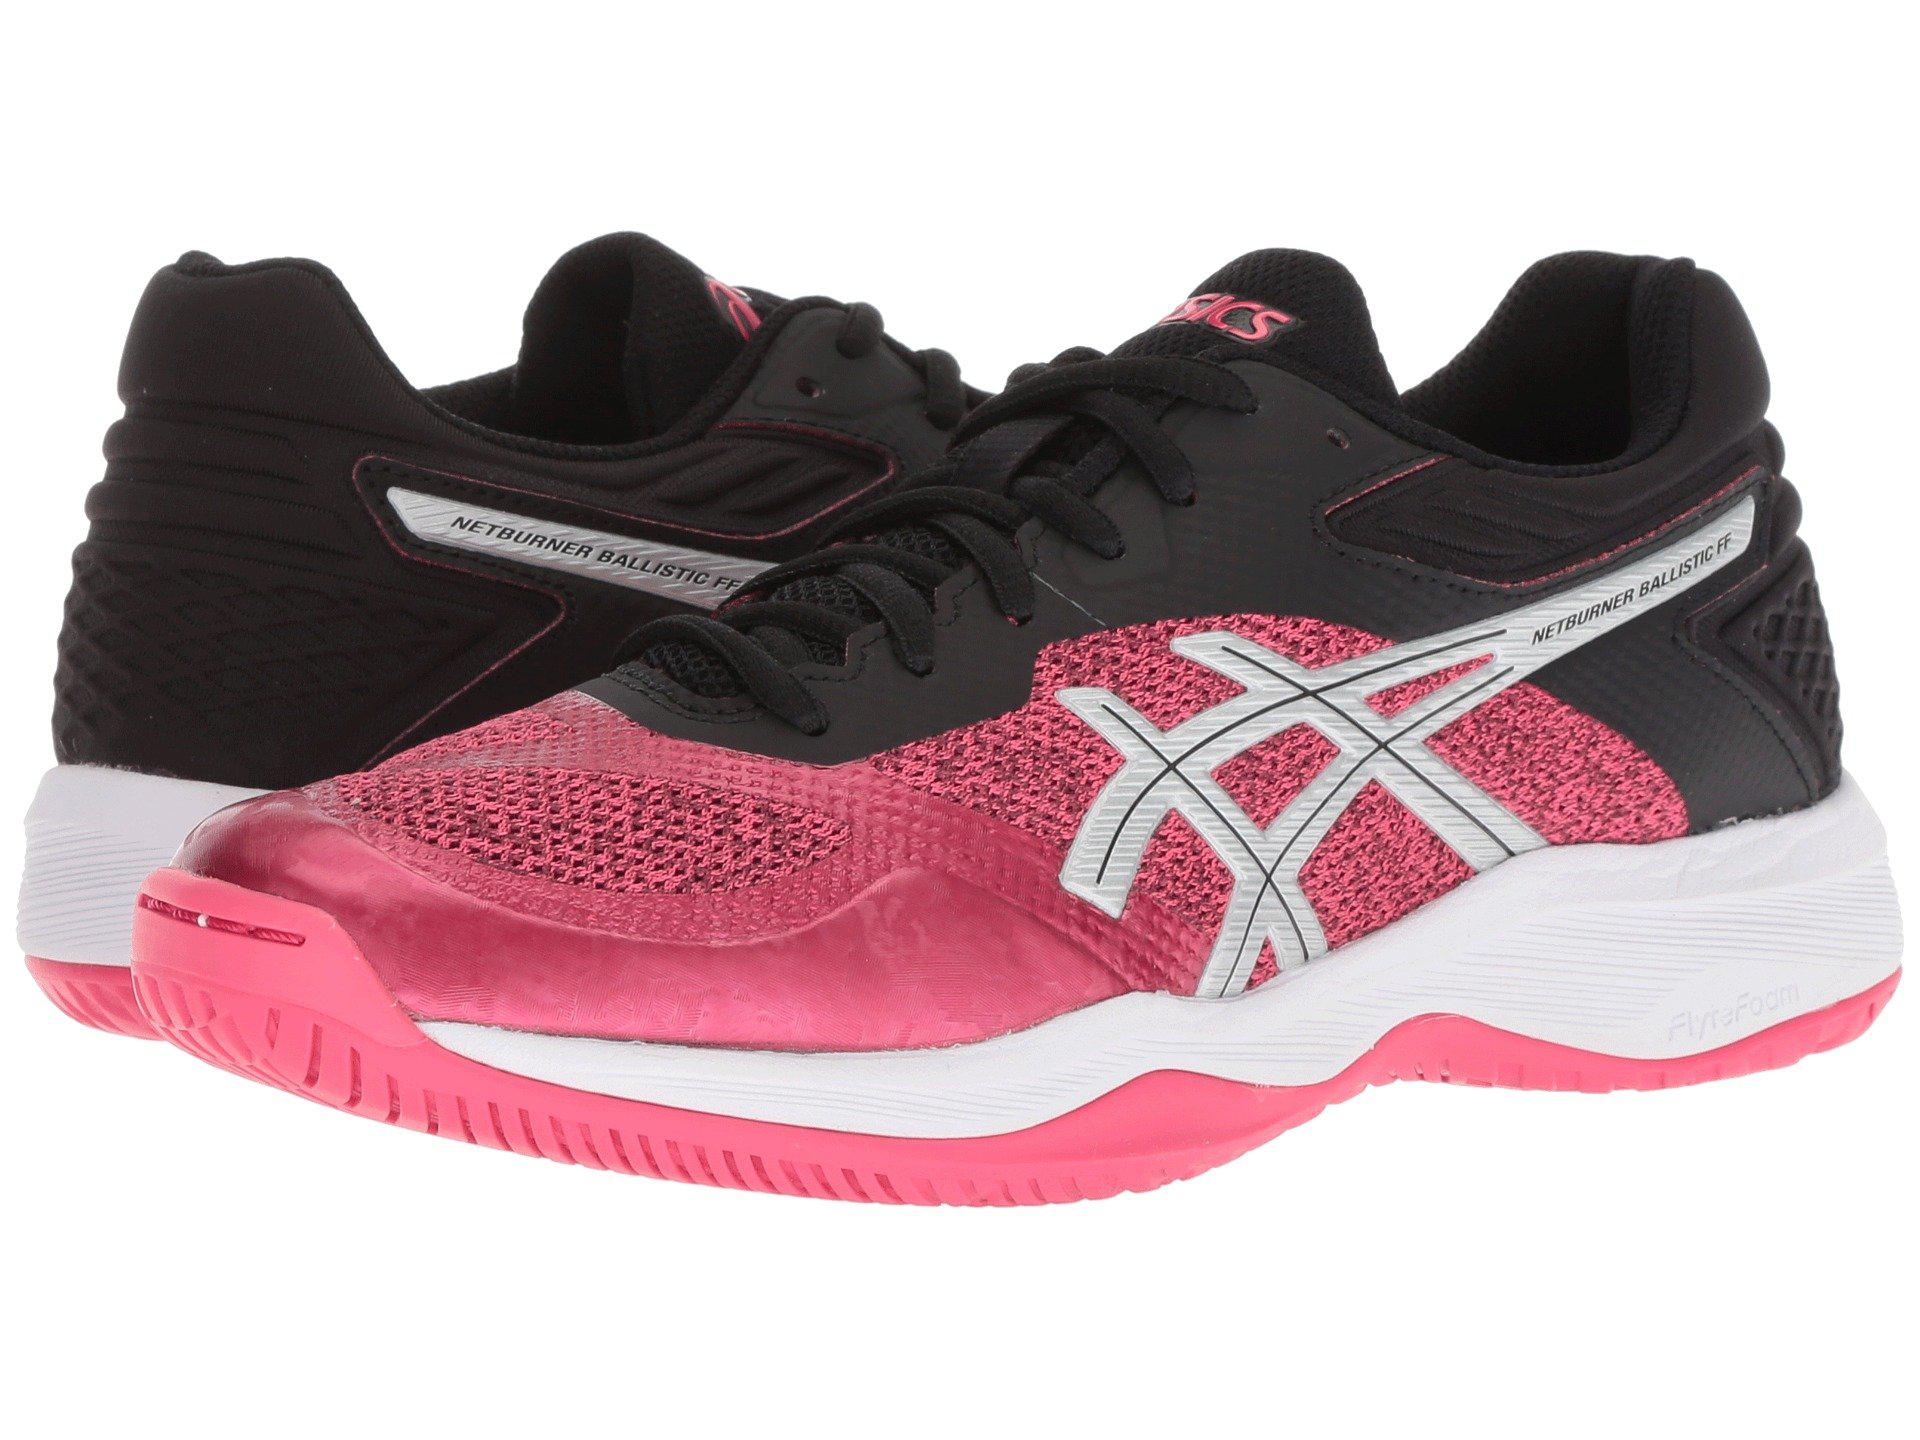 Women's Shoes Ballistic Ffpixel PinkwhiteVolleyball Netburner ul5JFc31TK